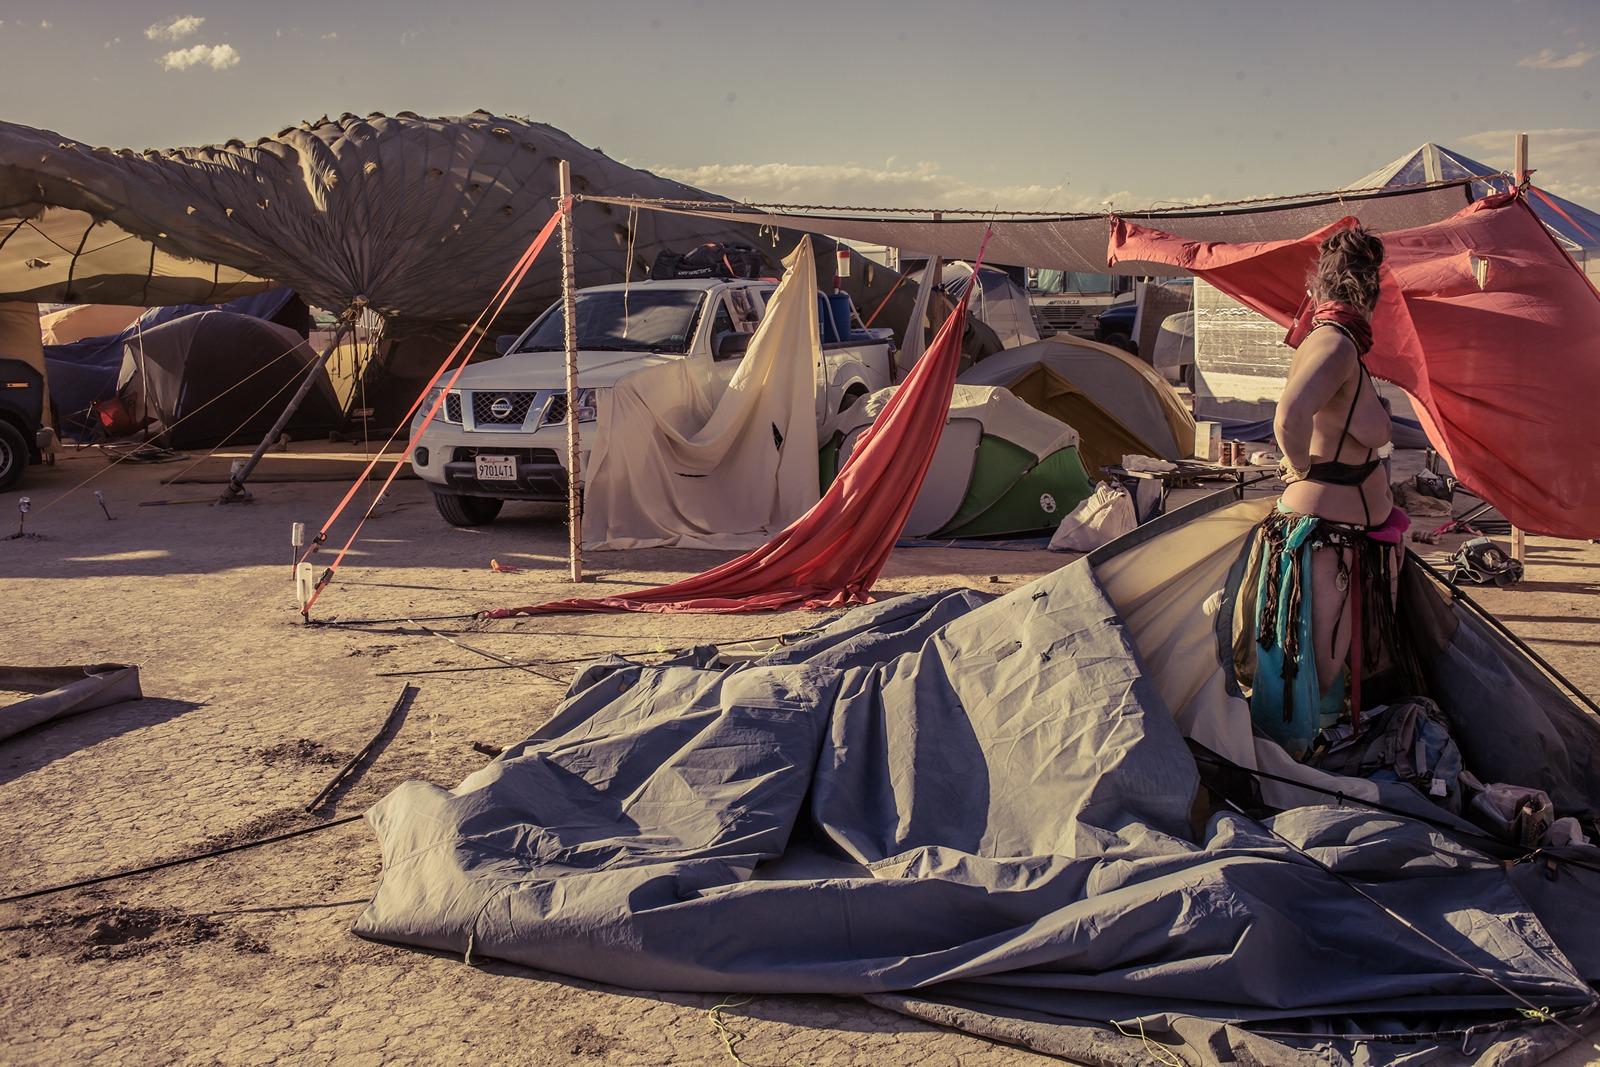 Burning Man - The wind wins